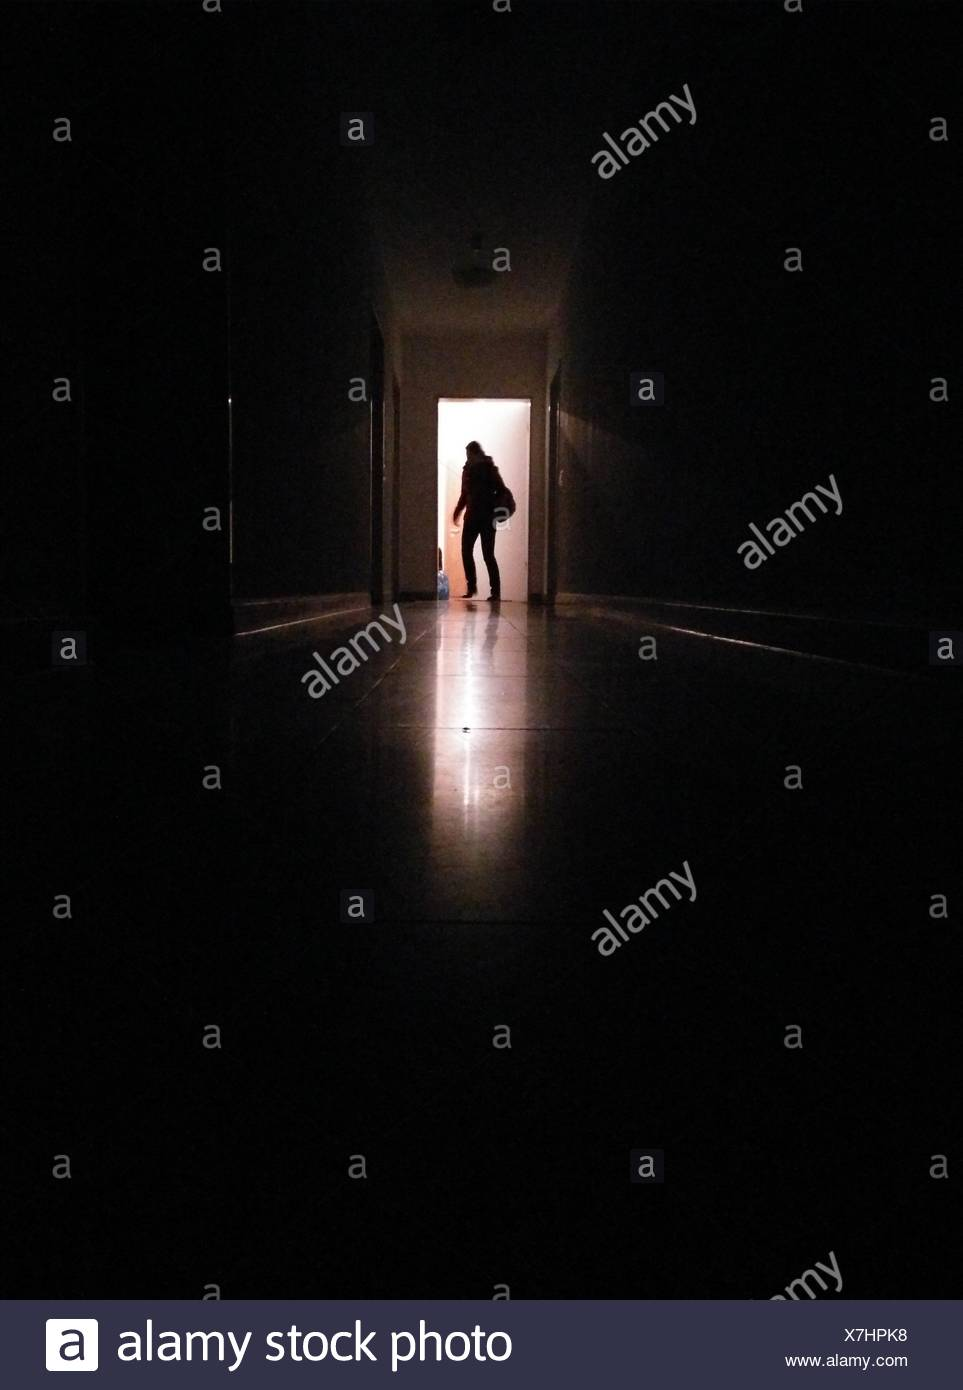 Silhouette Person In Corridor Entering Illuminated Room - Stock Image